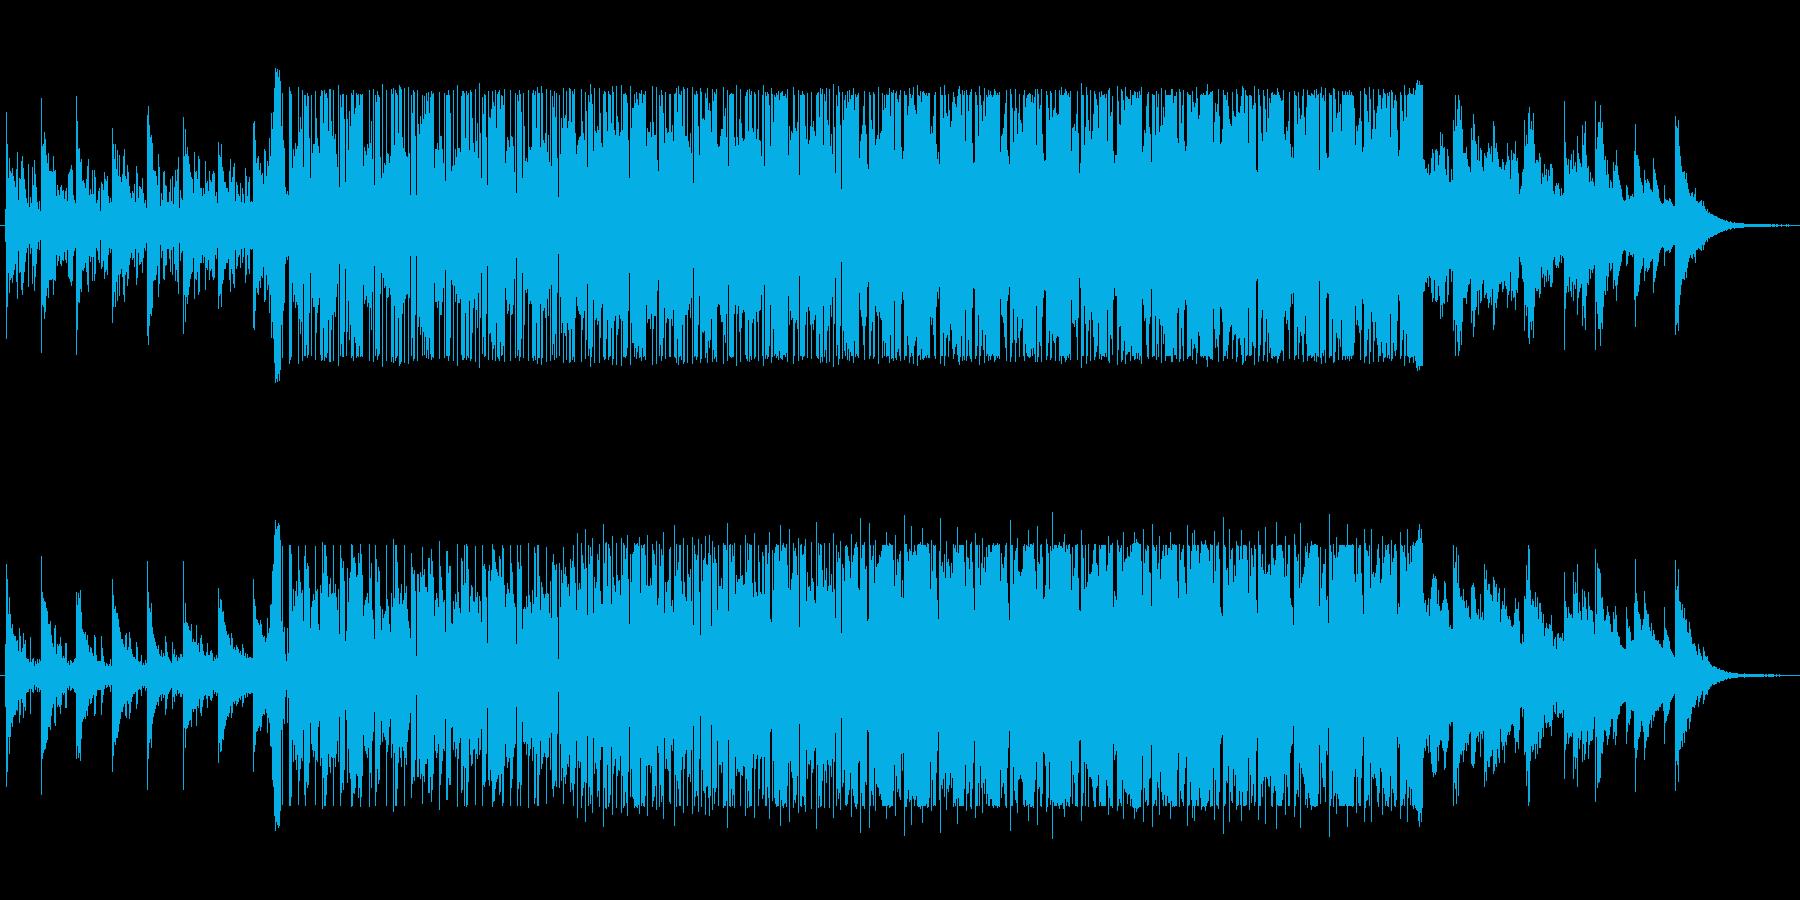 LoFiなイントロが印象的なチルアウトの再生済みの波形